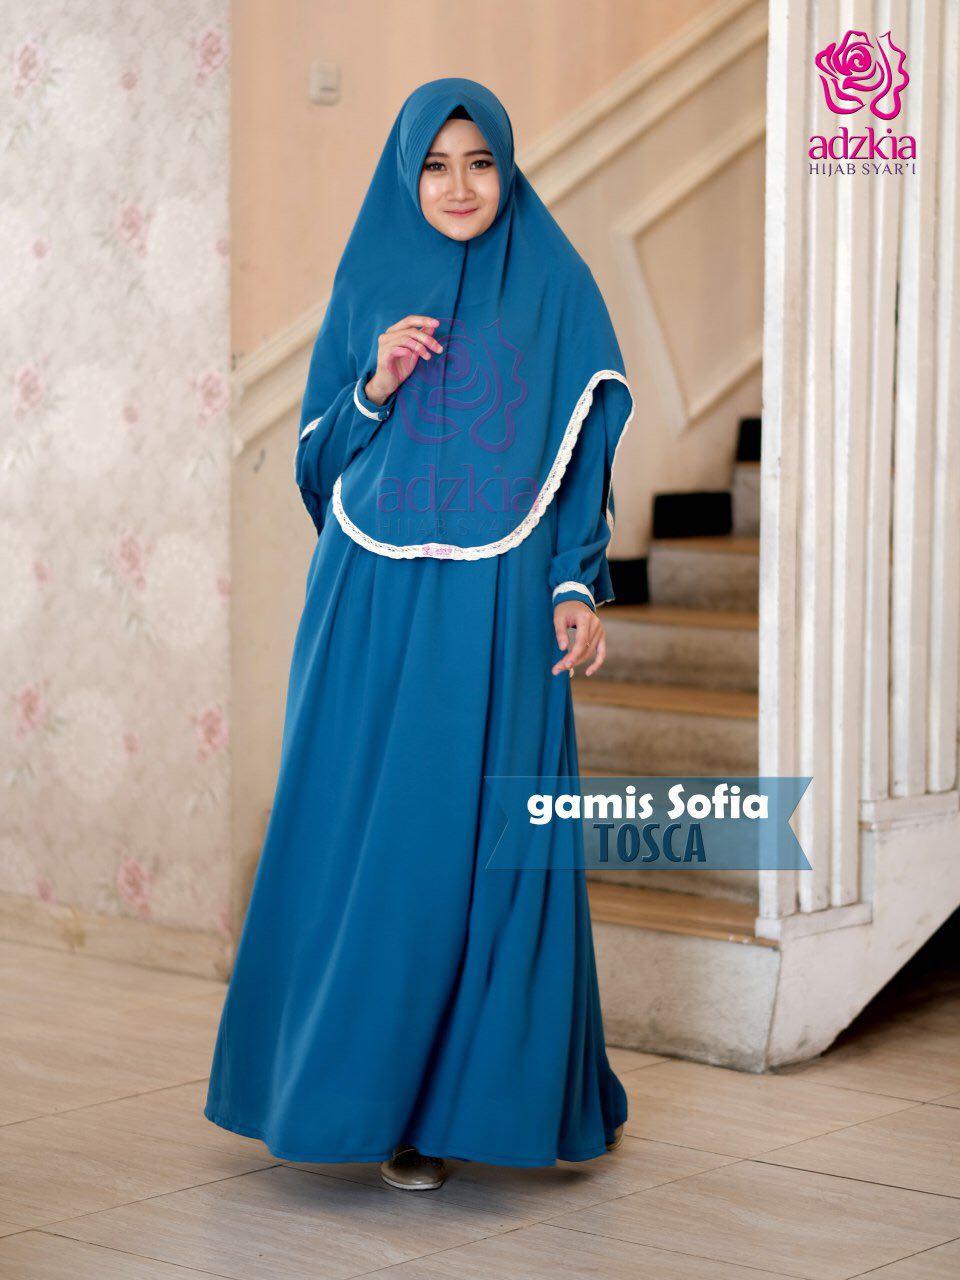 Maulidya Adzkia Hijab Syari Sofia Set Gamis Only Facebook